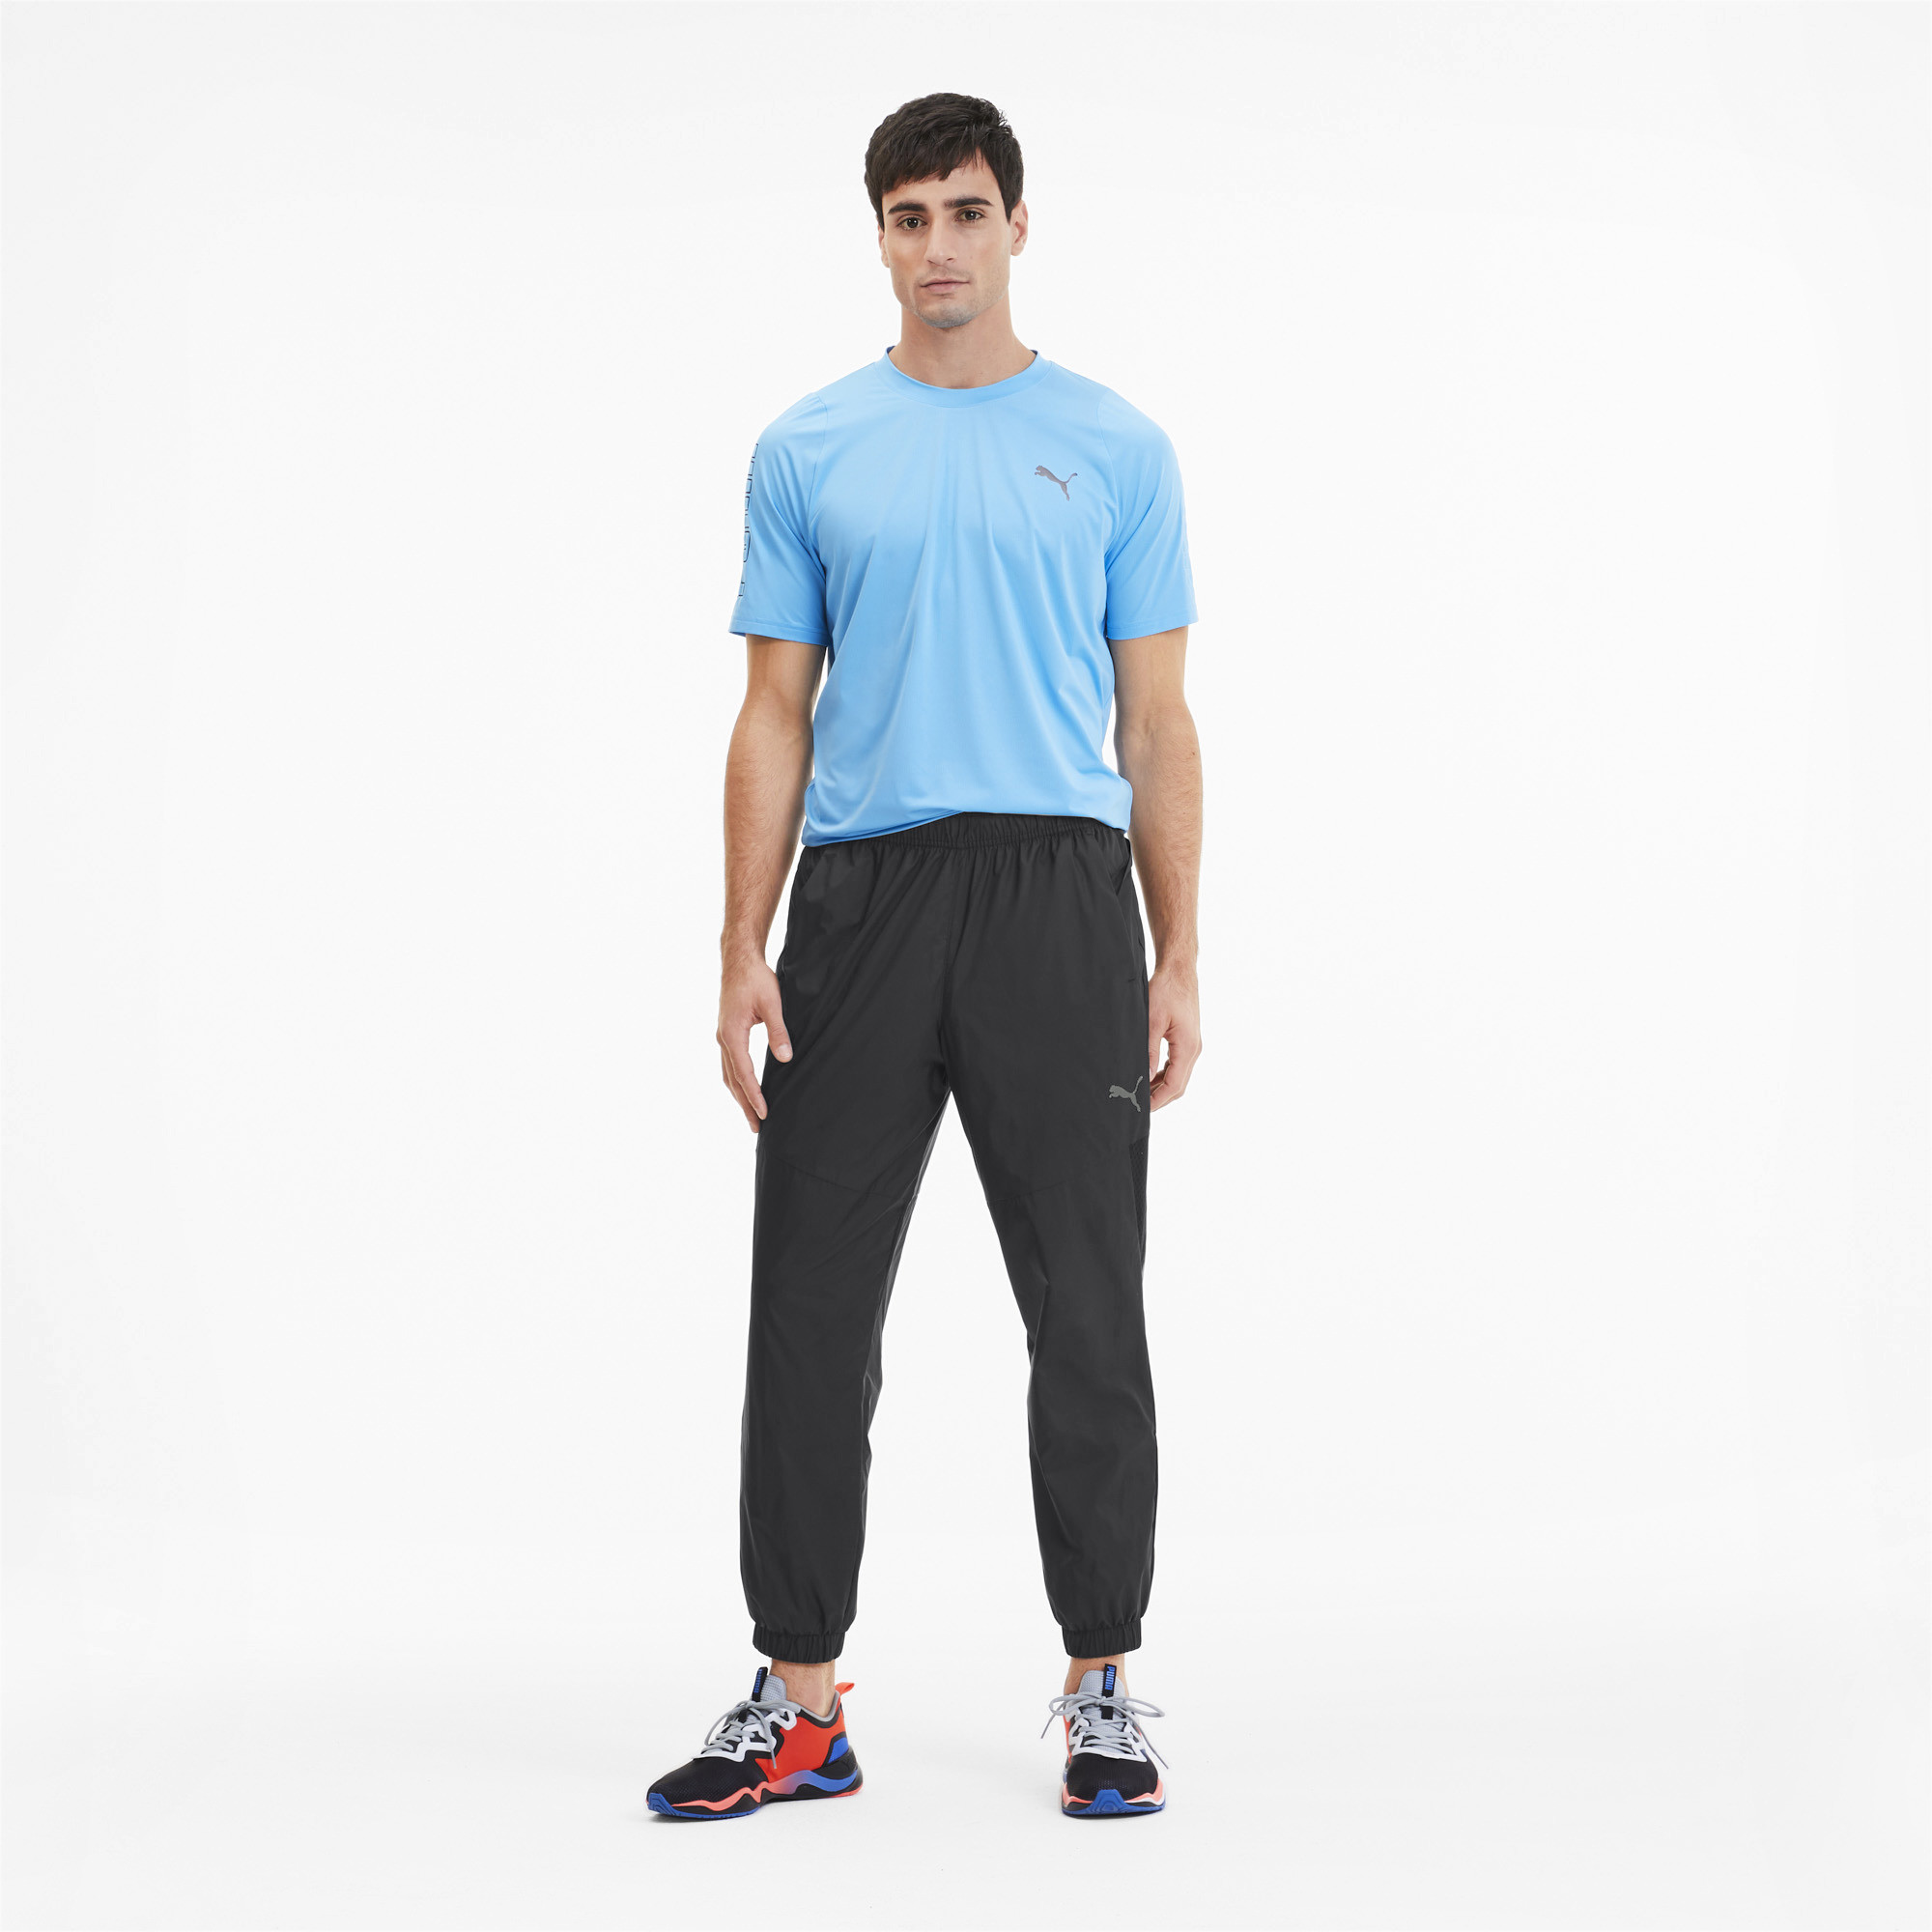 PUMA-Reactive-Men-039-s-Woven-Training-Pants-Men-Woven-Pants-Training thumbnail 6